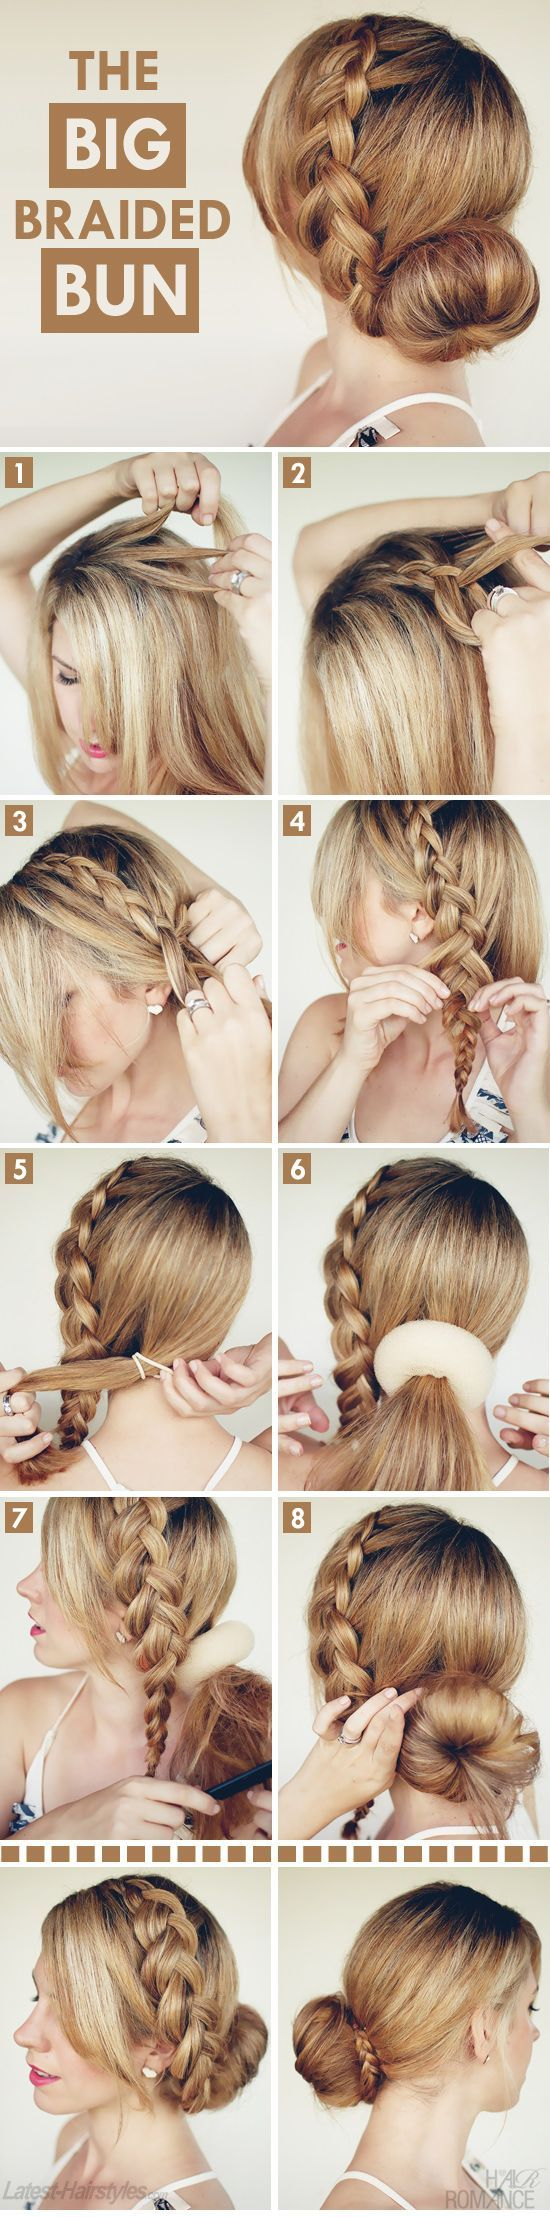 Side braided bun hair and makeup pinterest hair style updo